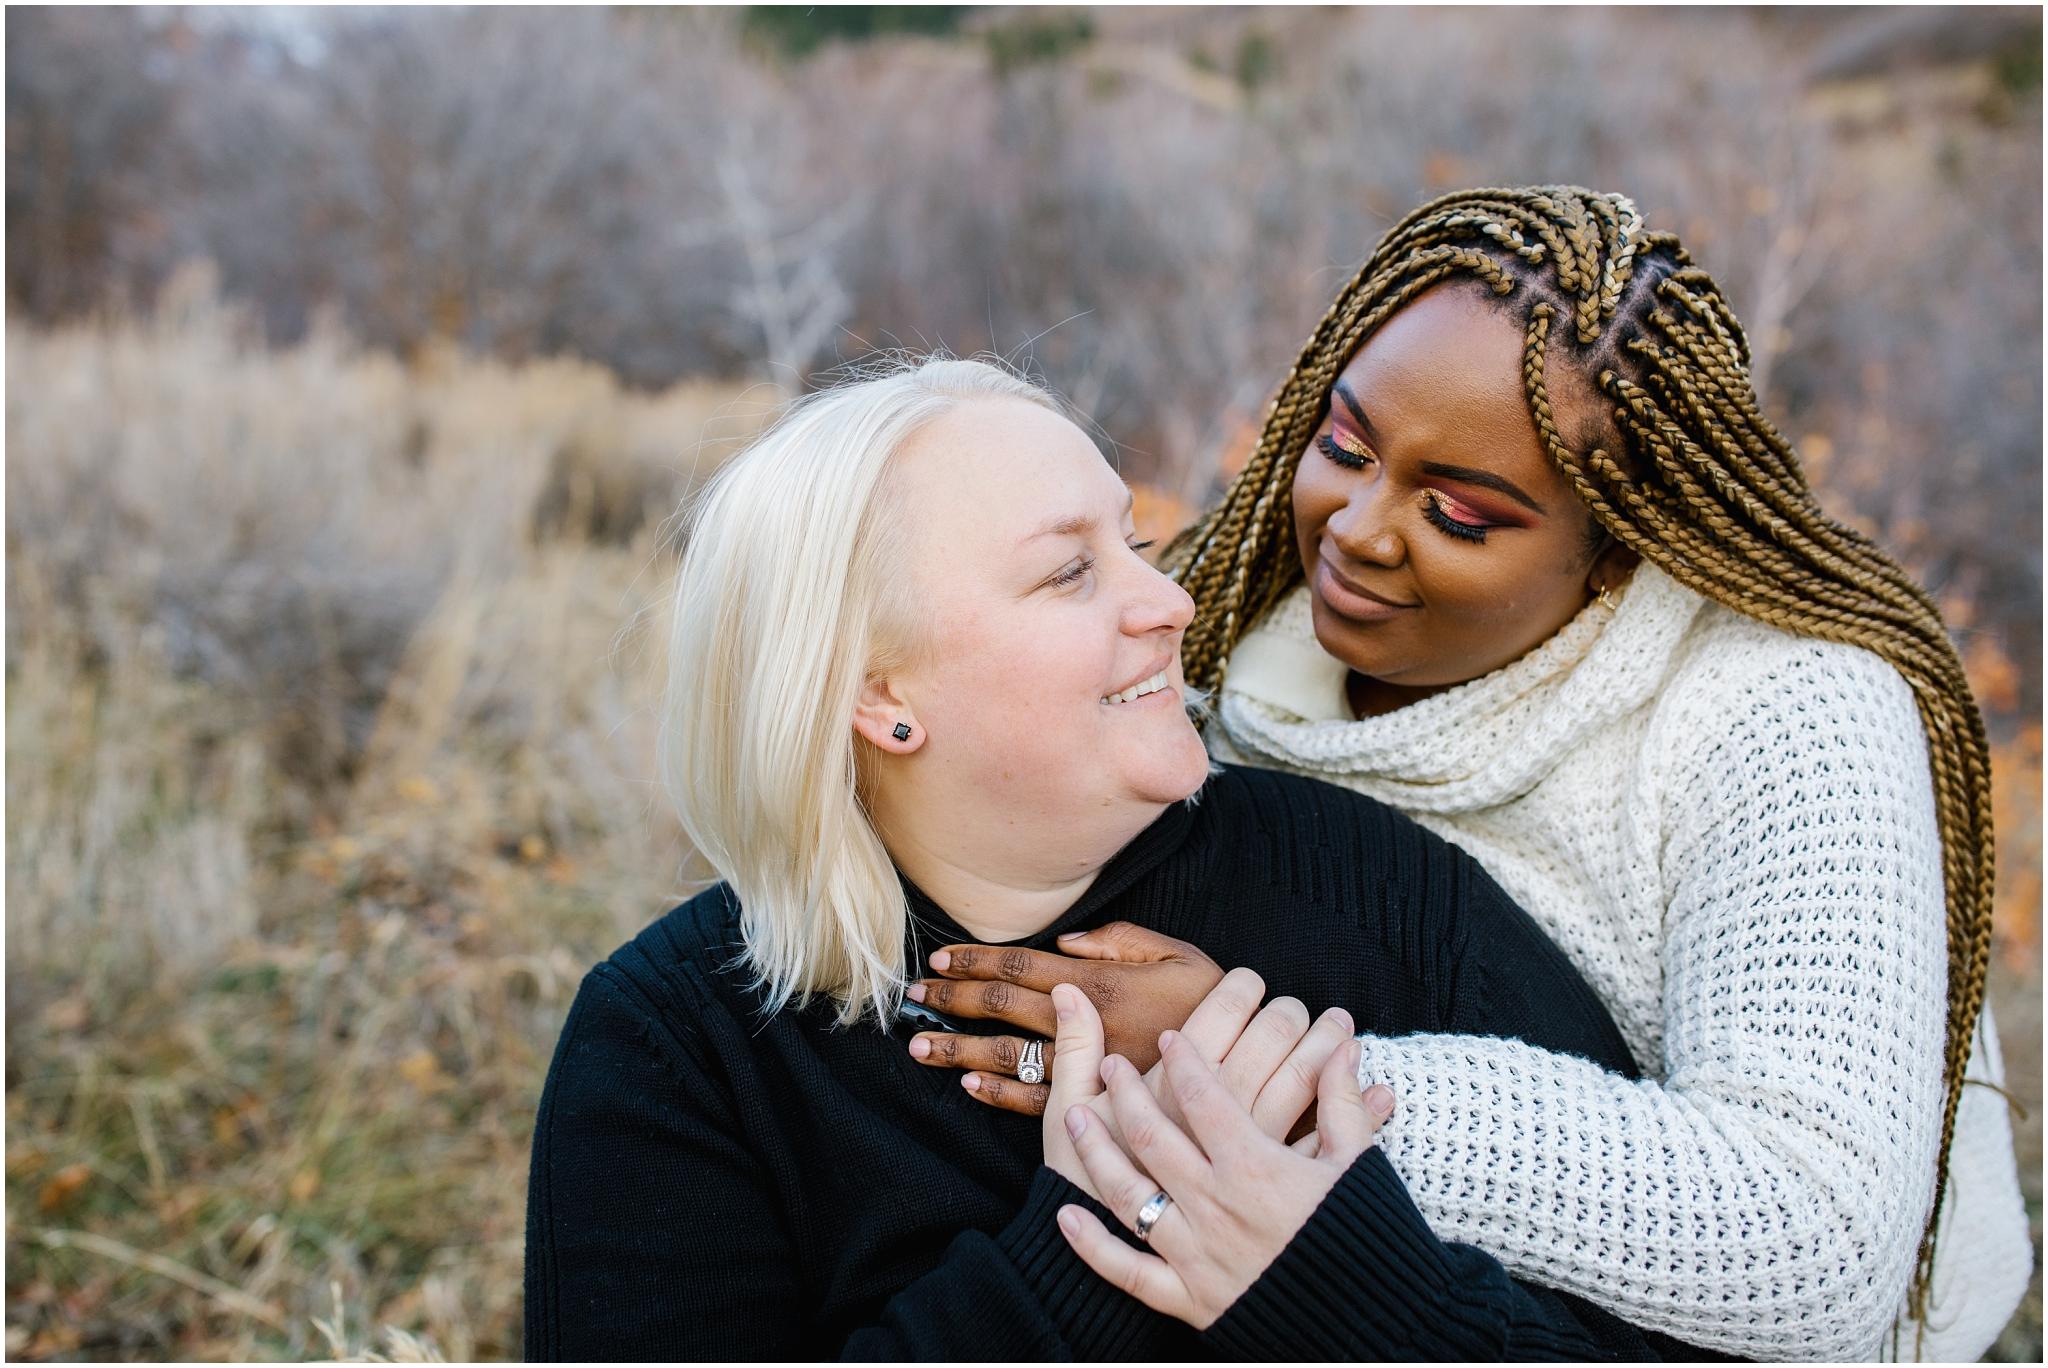 LisaTiffany2018-139_Lizzie-B-Imagery-Utah-Family-Photographer-Salt-Lake-City-Park-City-Miners-Hospital-Community-Center.jpg